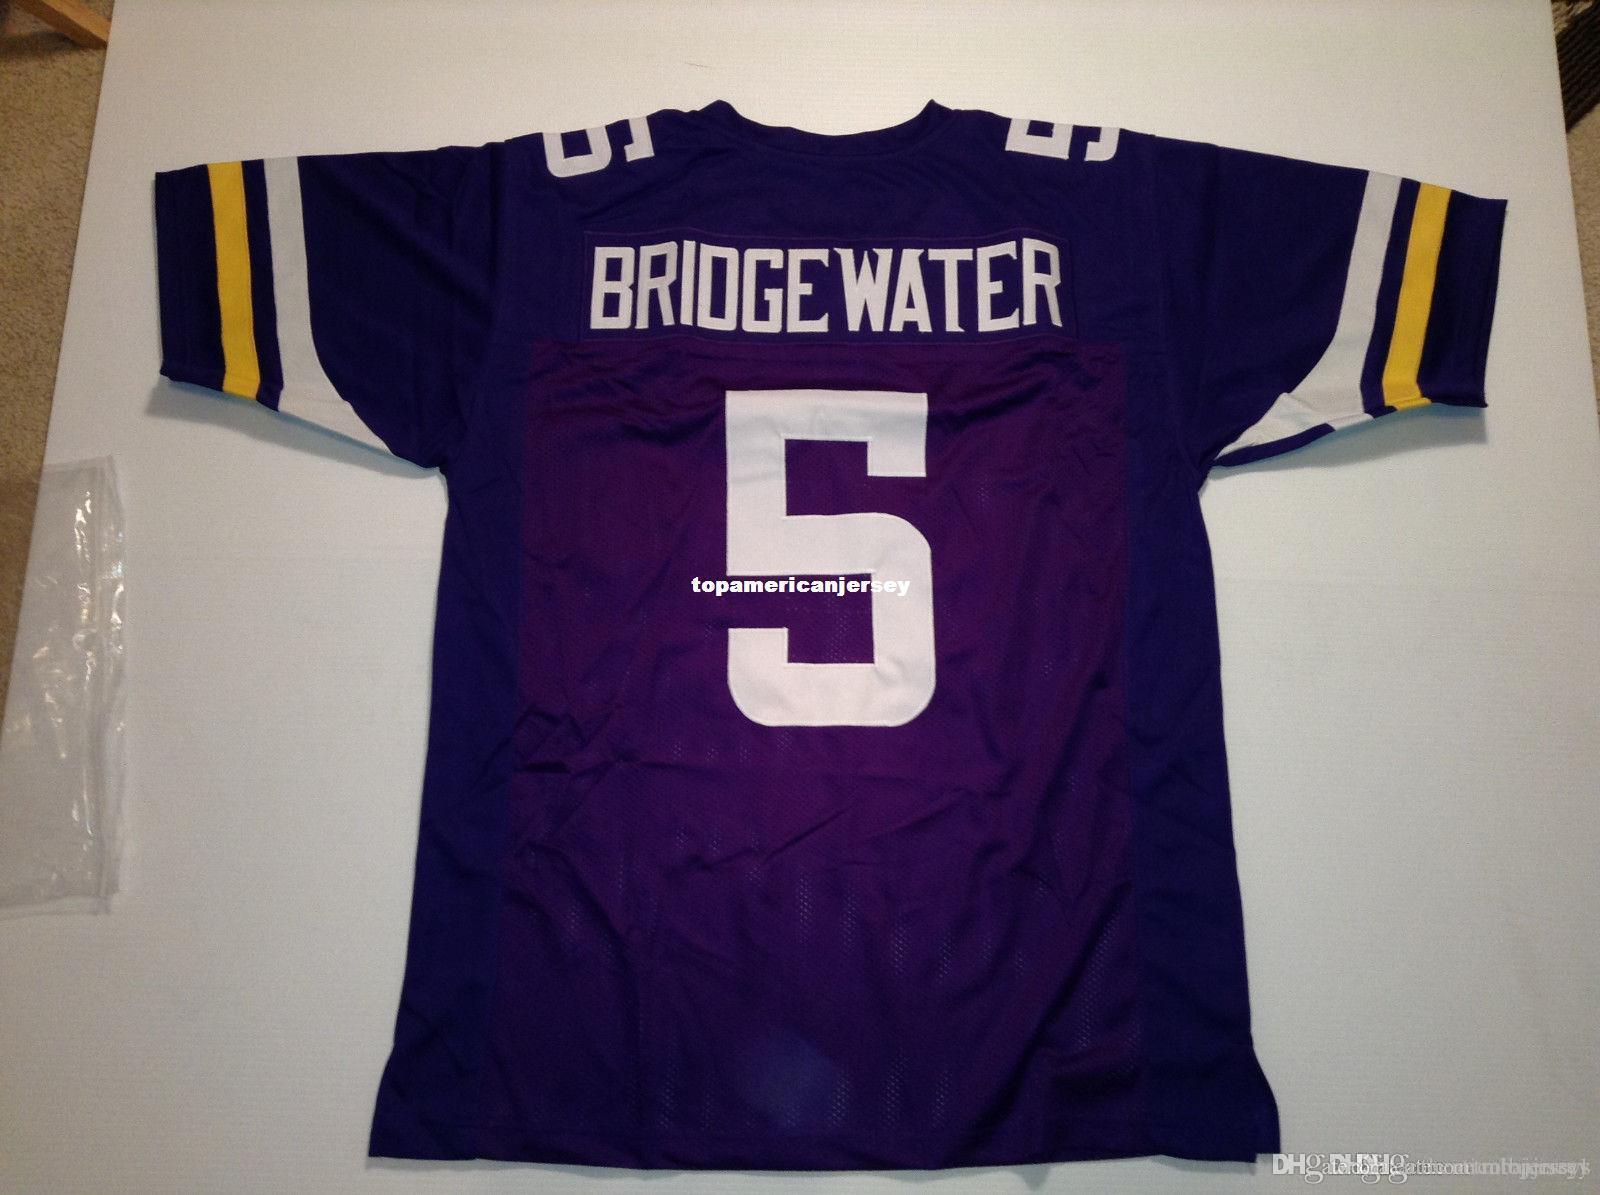 Ucuz Retro özel Dikişli 5. Teddy Bridewater Mor MITCHELL NESS Jersey Üst S-5XL, 6XL Erkek Futbol Formalar Rugby dikili